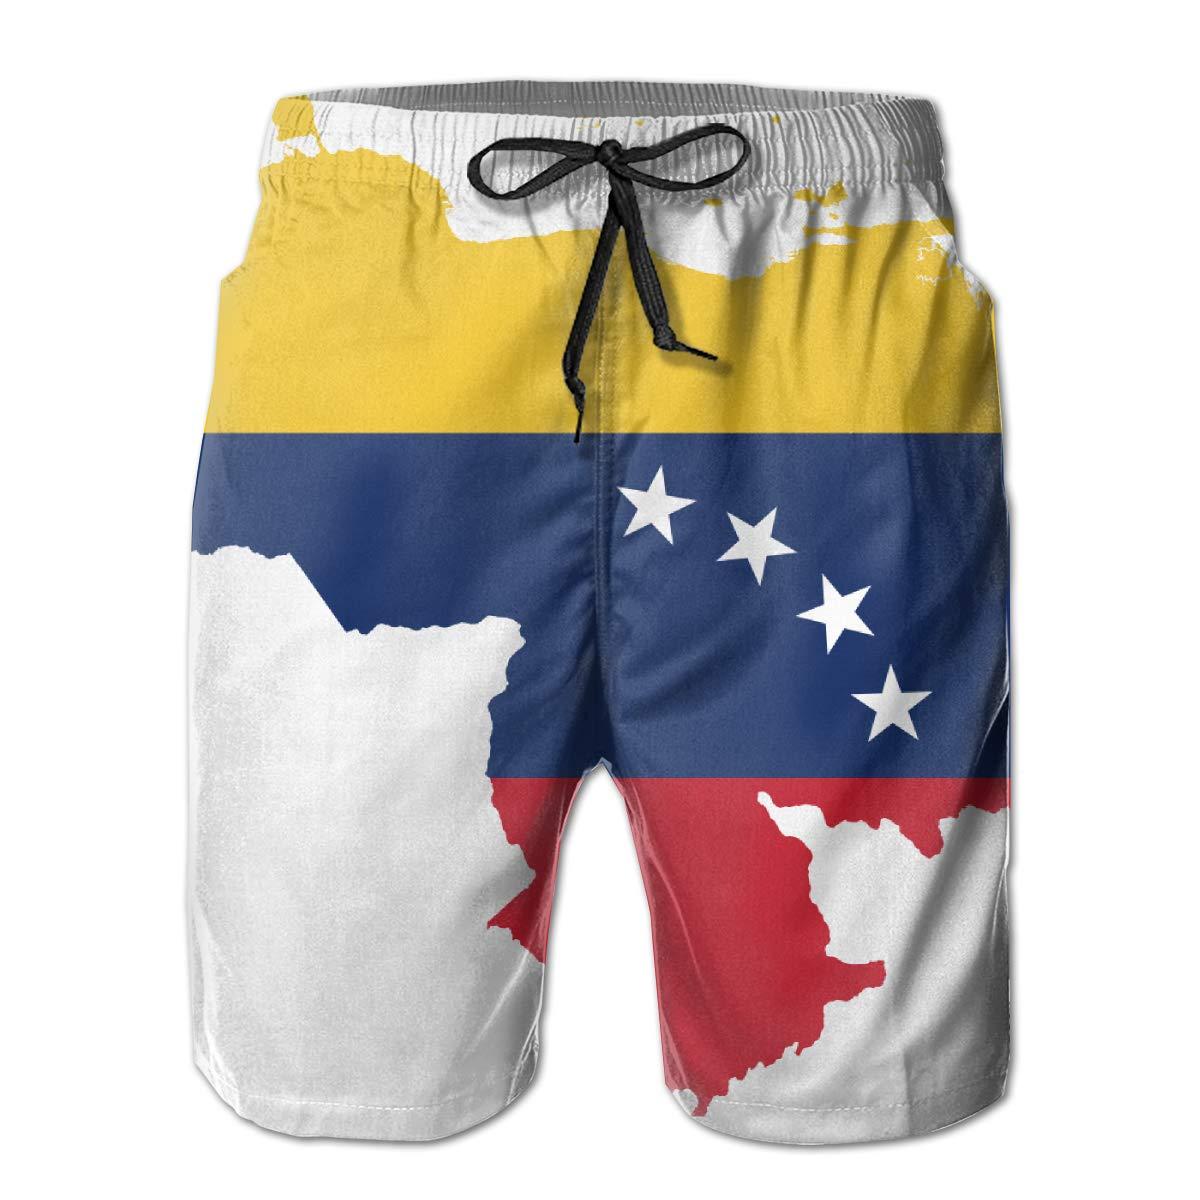 KIENGG Mens Swim Trunks with Mesh Lining Pockets Venezuela Flag Map Boys Polyester Board Shorts Swimwear